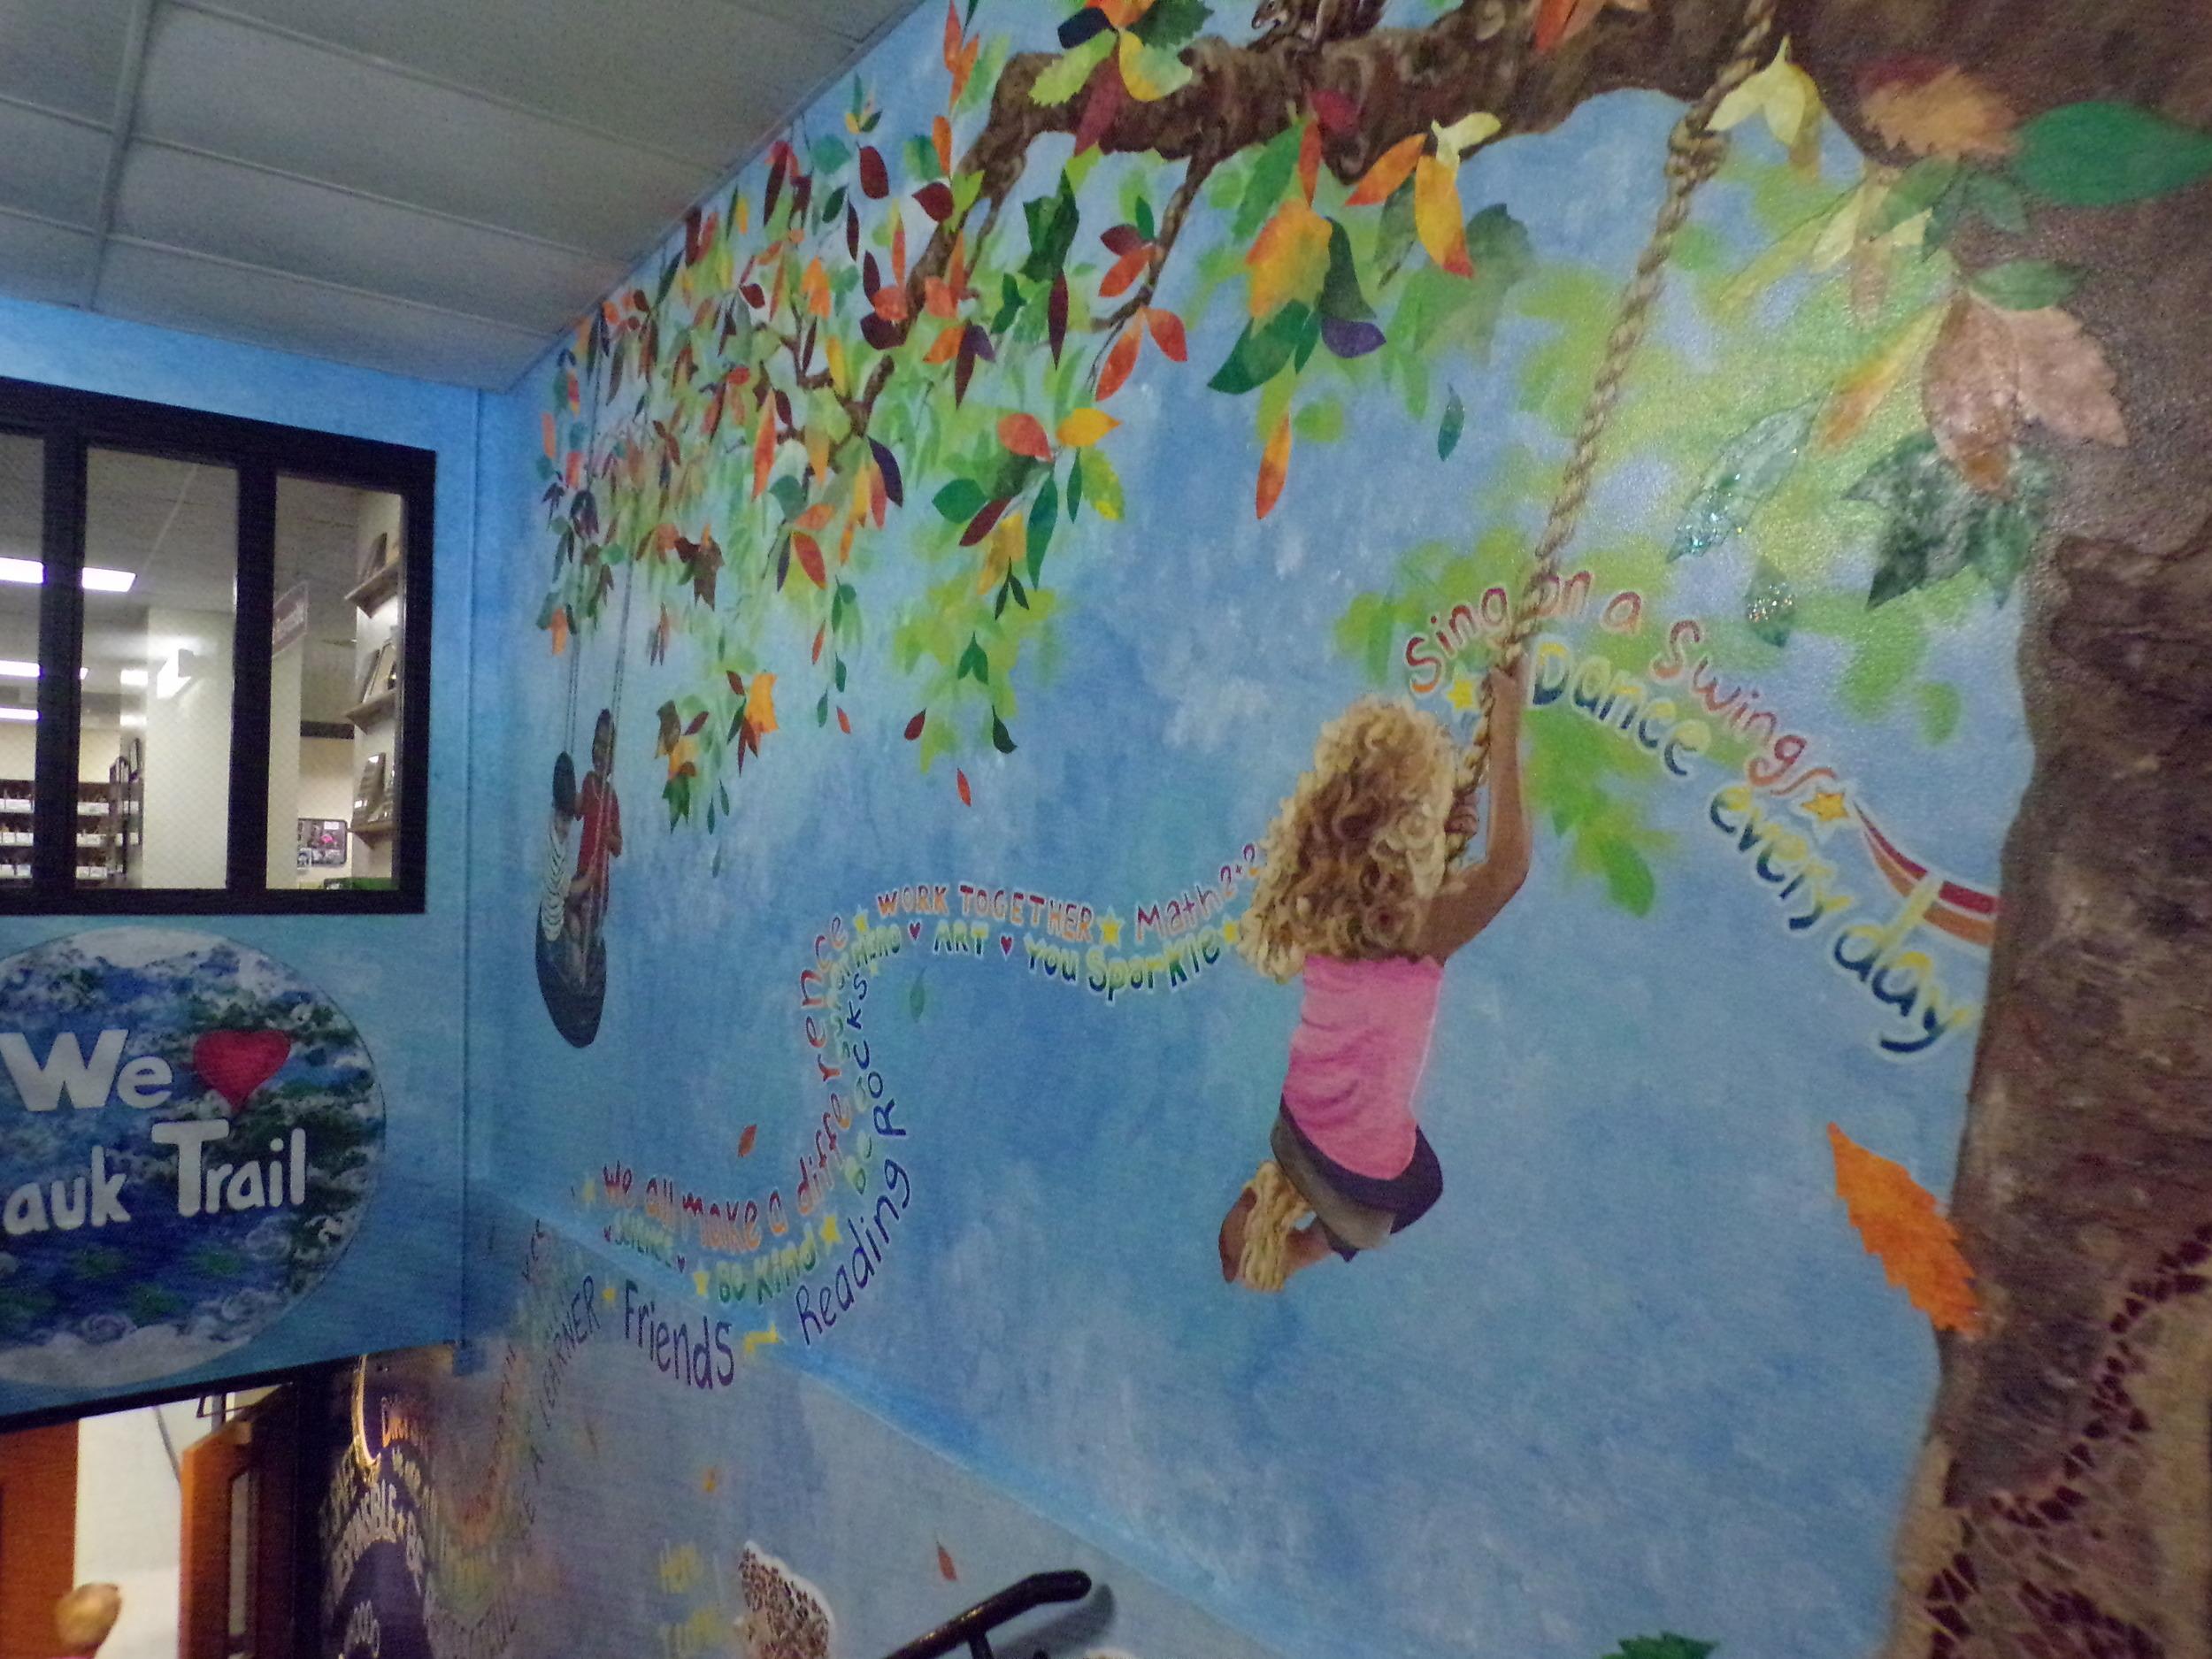 Mural at Sauk Trail Elementary School, Middleton